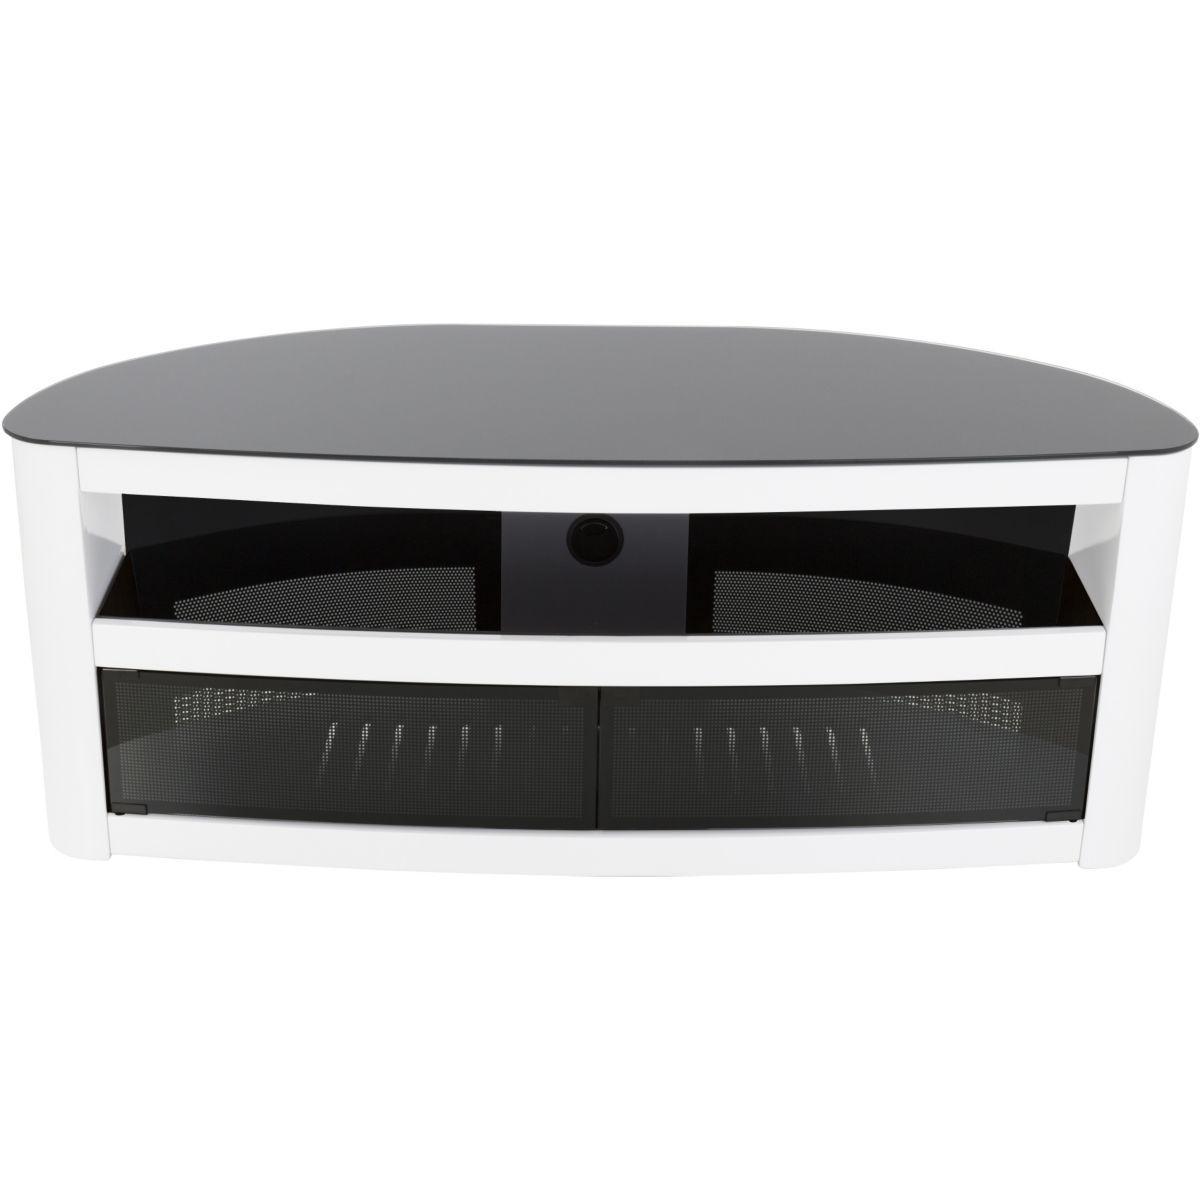 meuble tv avf burghley plus blanc brillant 1 25m vendu par webdistrib 5918428. Black Bedroom Furniture Sets. Home Design Ideas